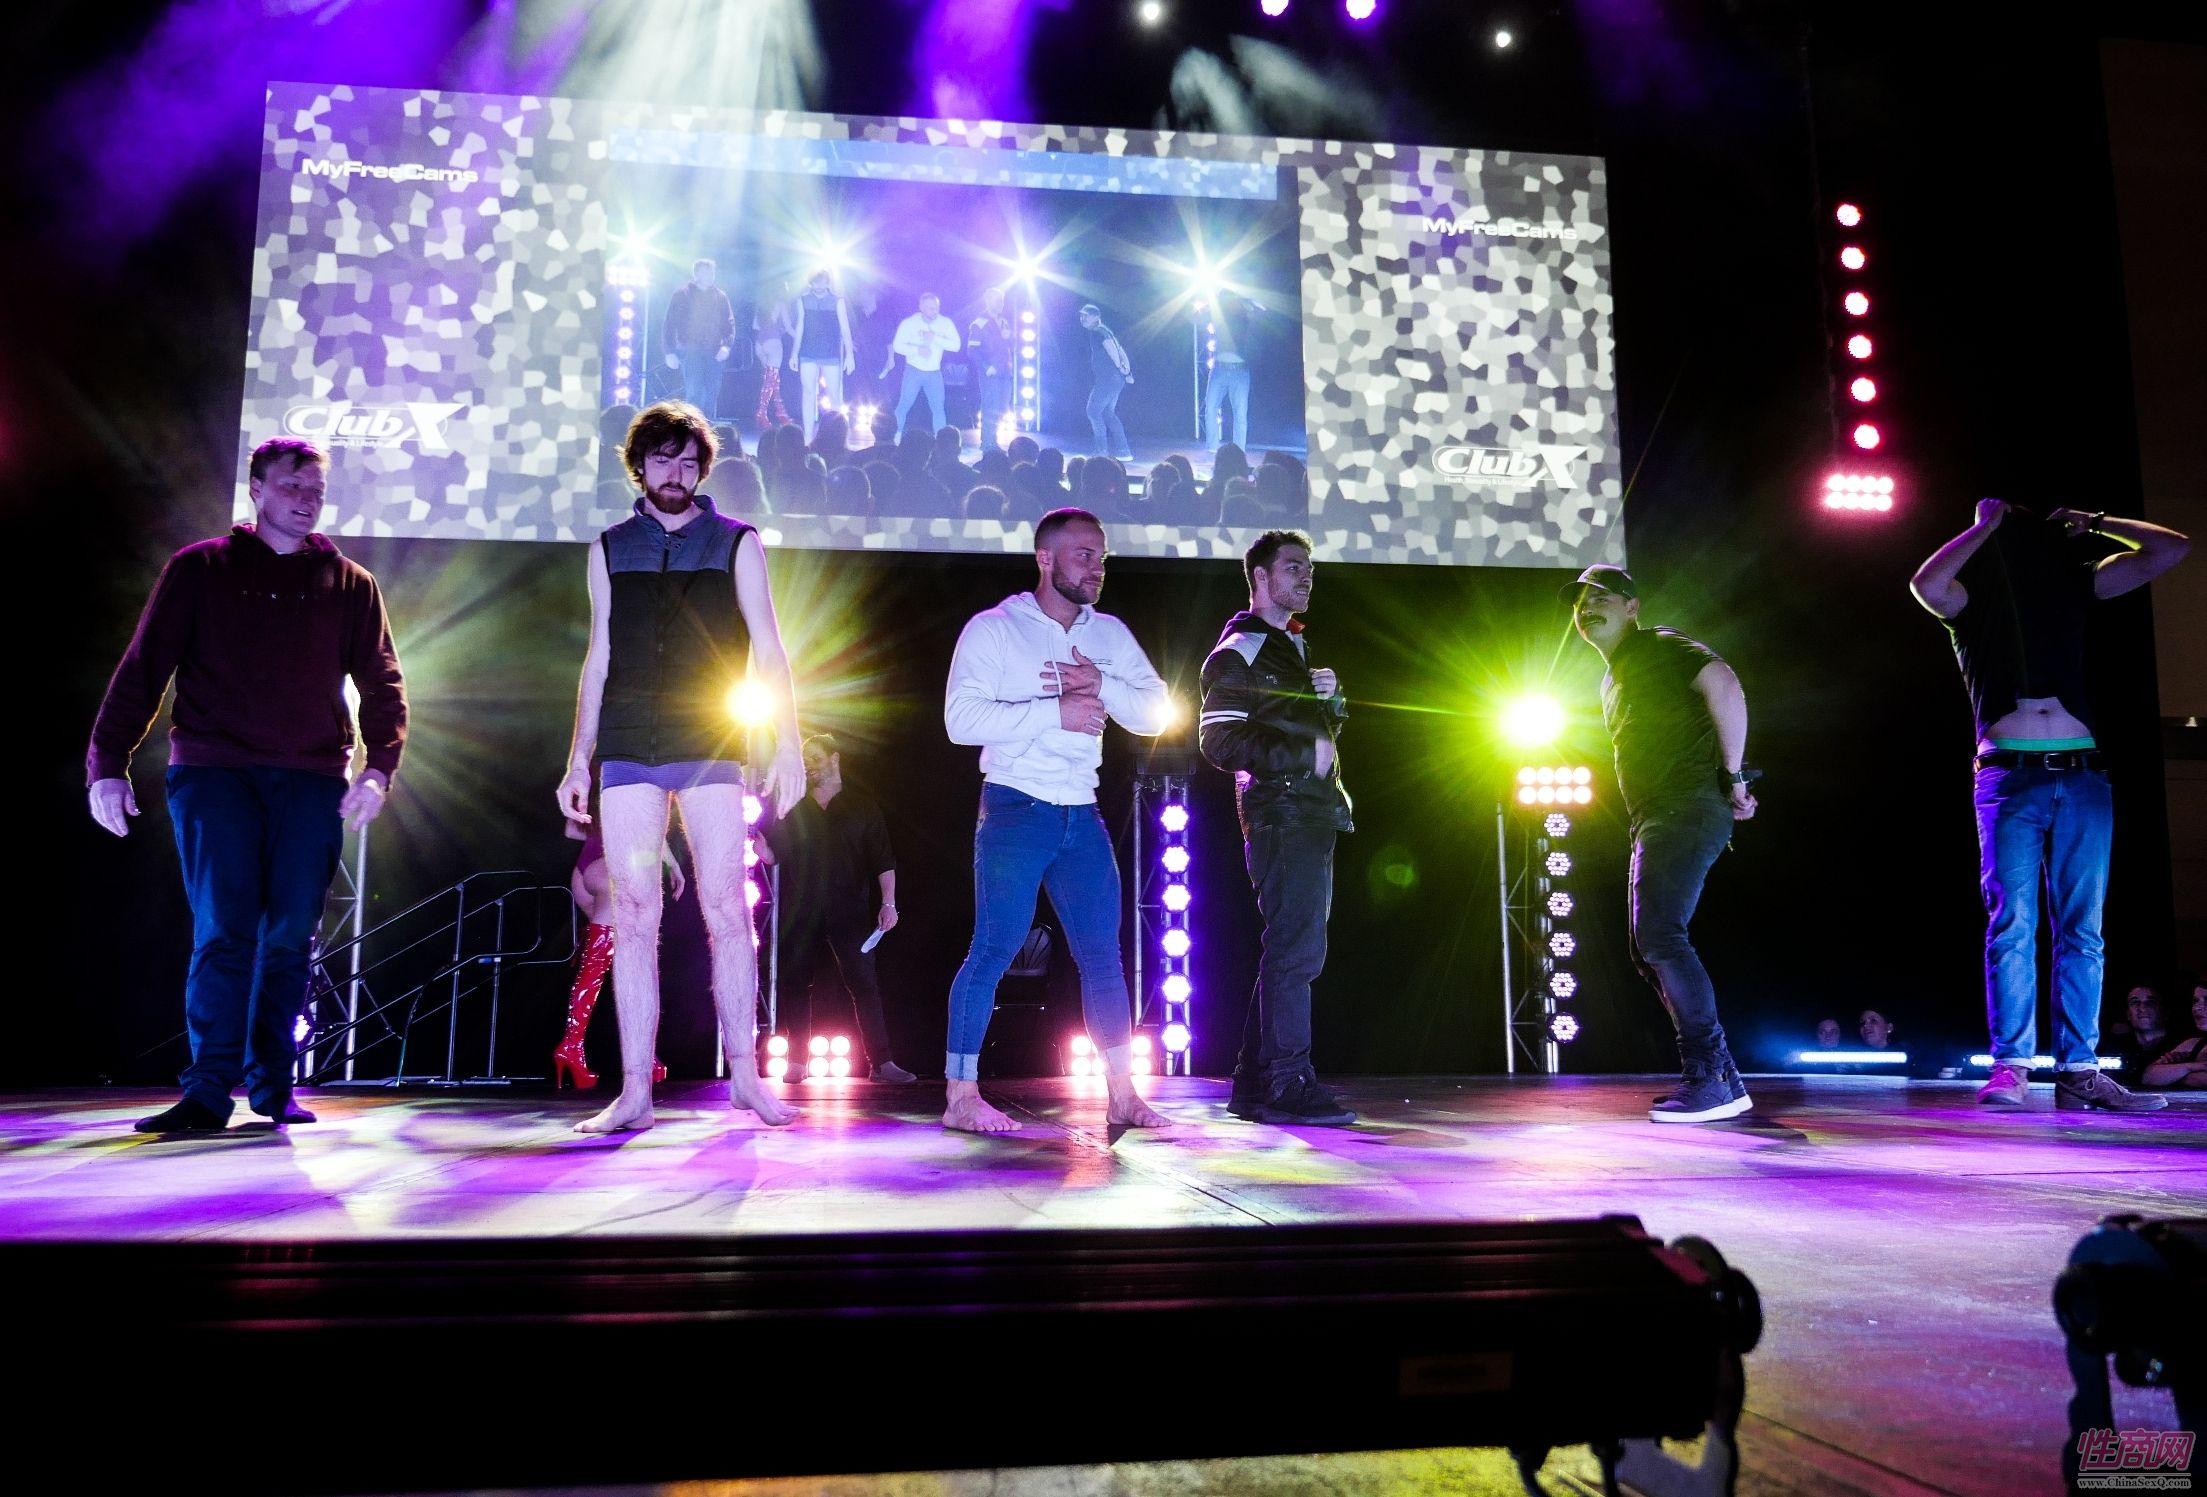 Sexpo成人展的特色活动:素人脱衣舞比赛,现场观众直接报名参加